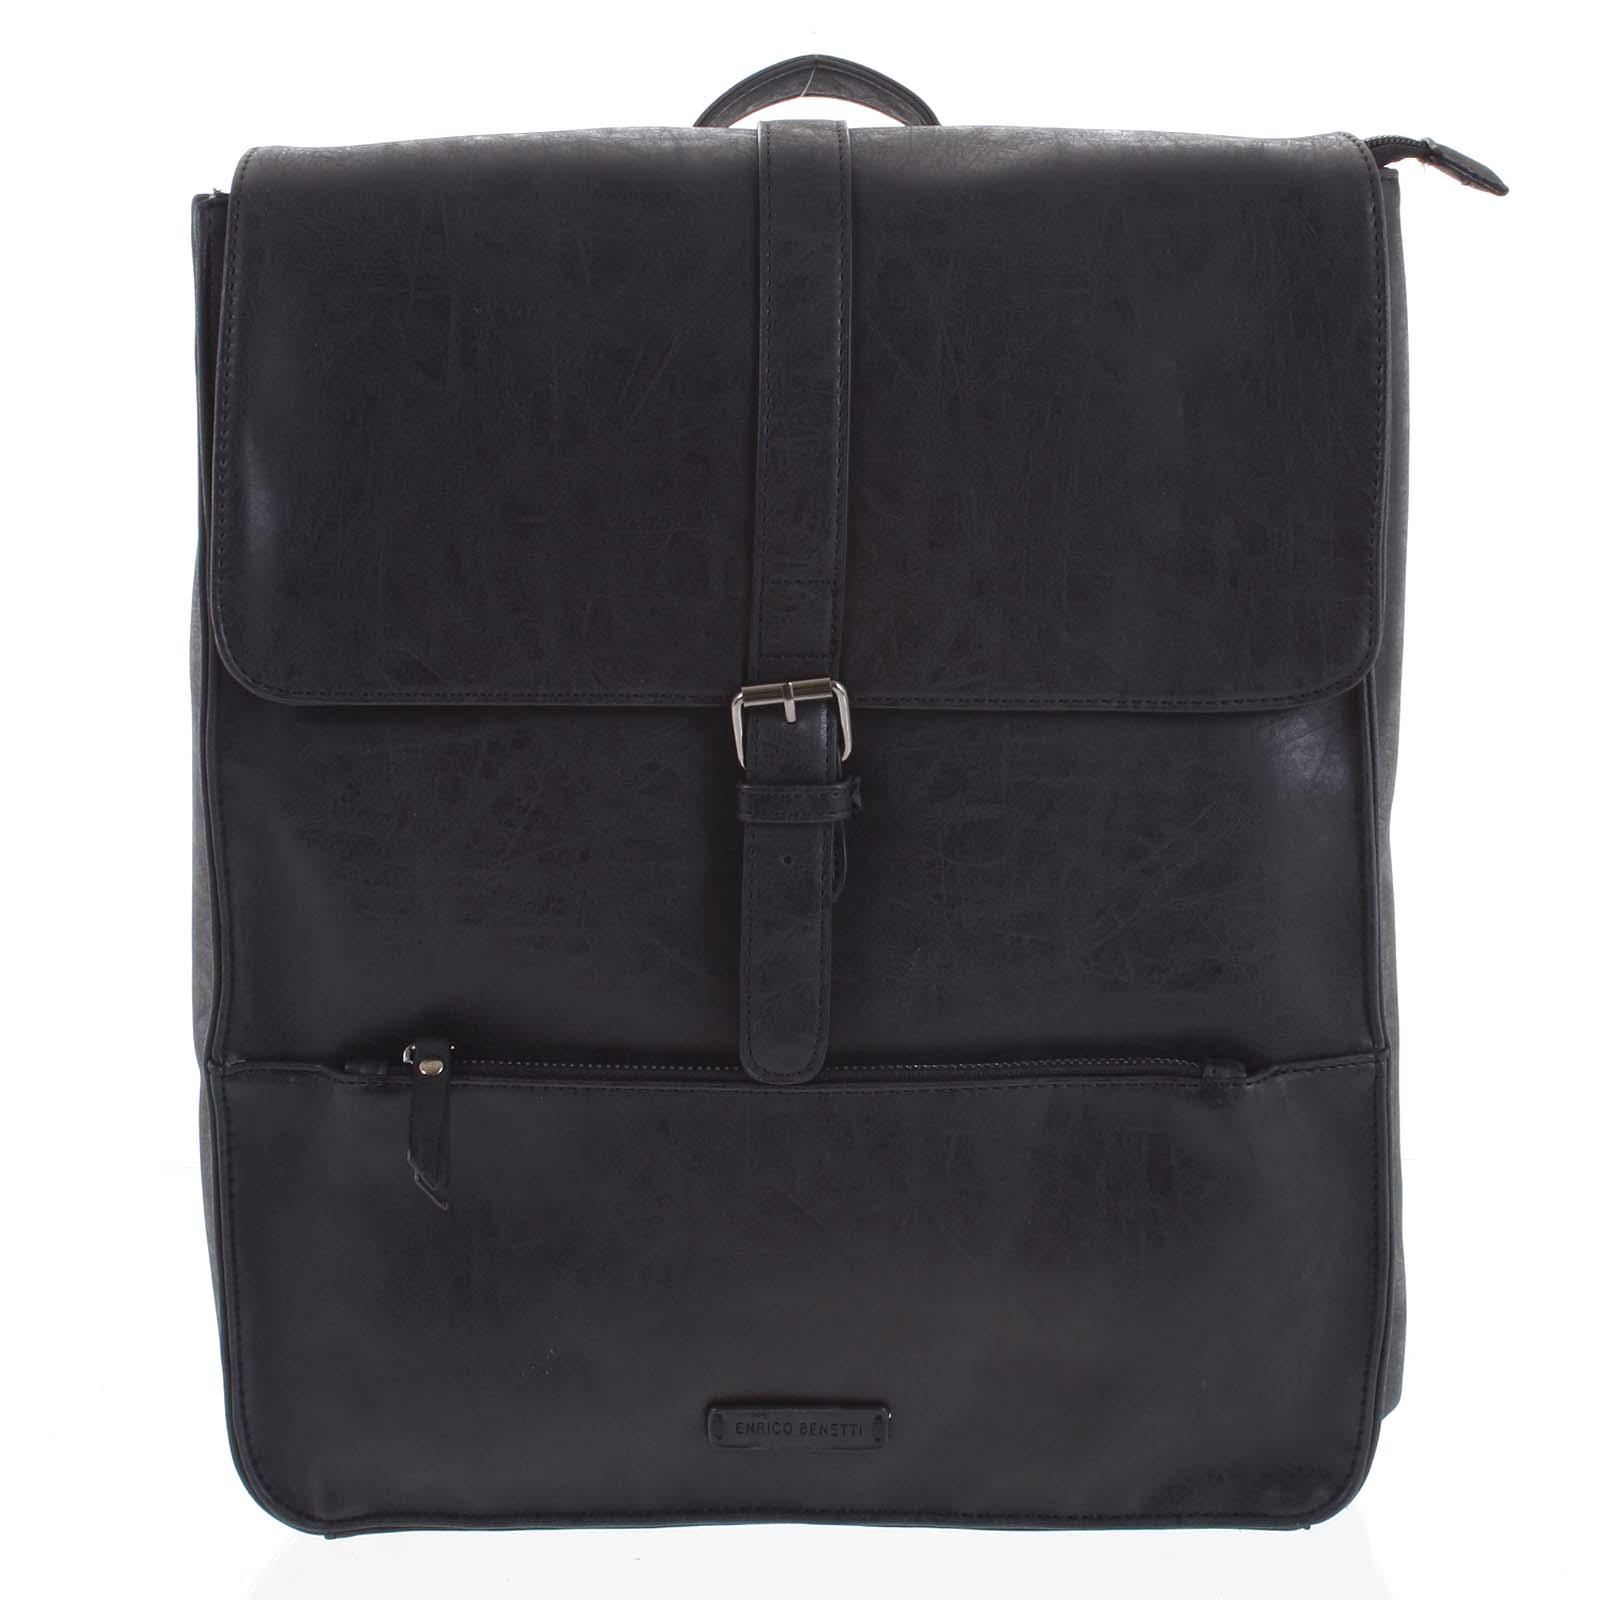 Pánsky batoh čierny - Enrico Benetti Kaarlo